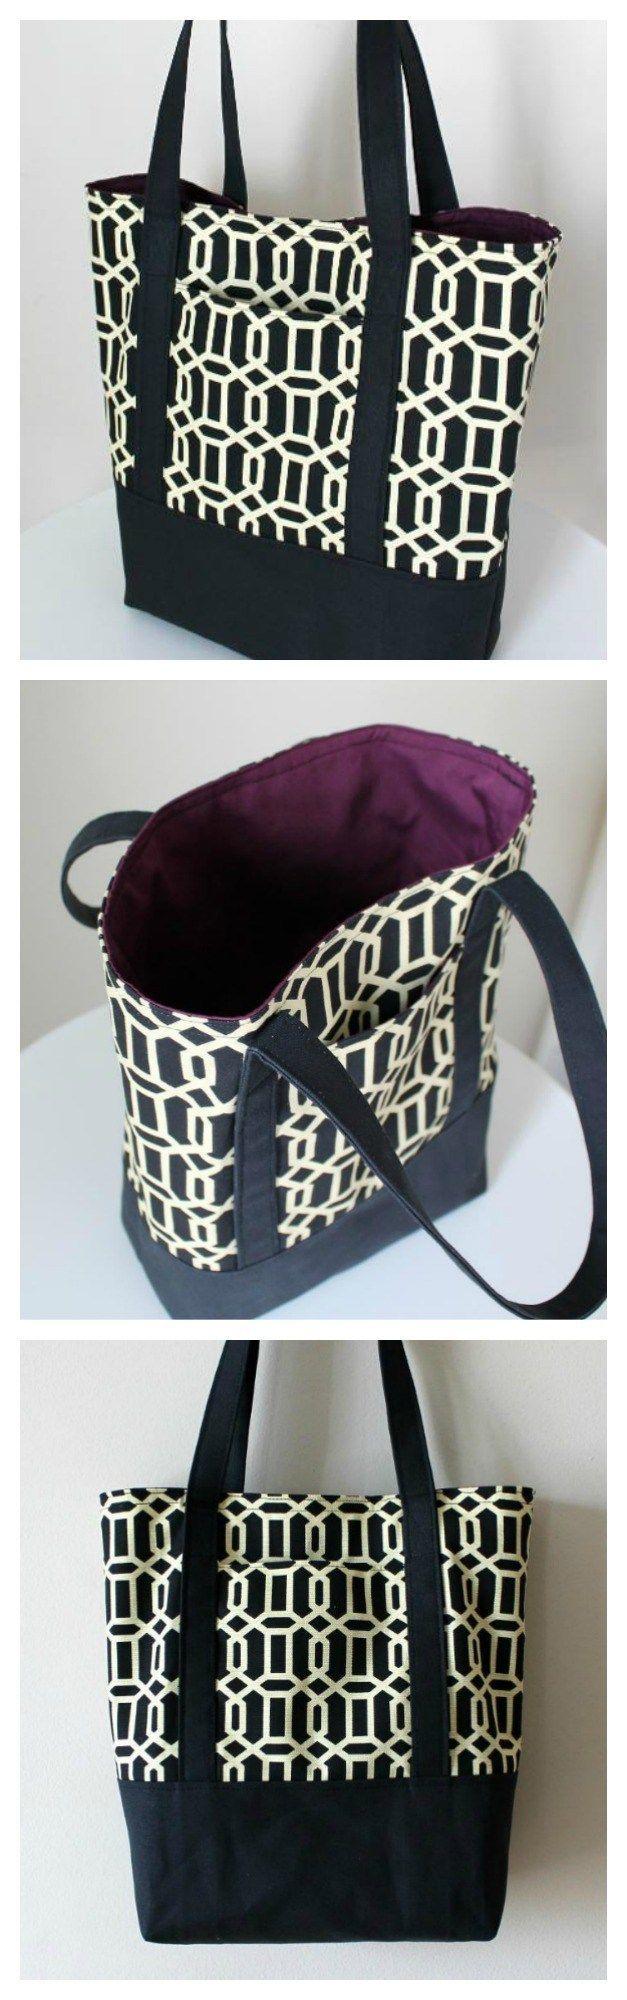 Sew a Must-Have Multitasking Bag: Tutorial + FREE Tote Pattern ...